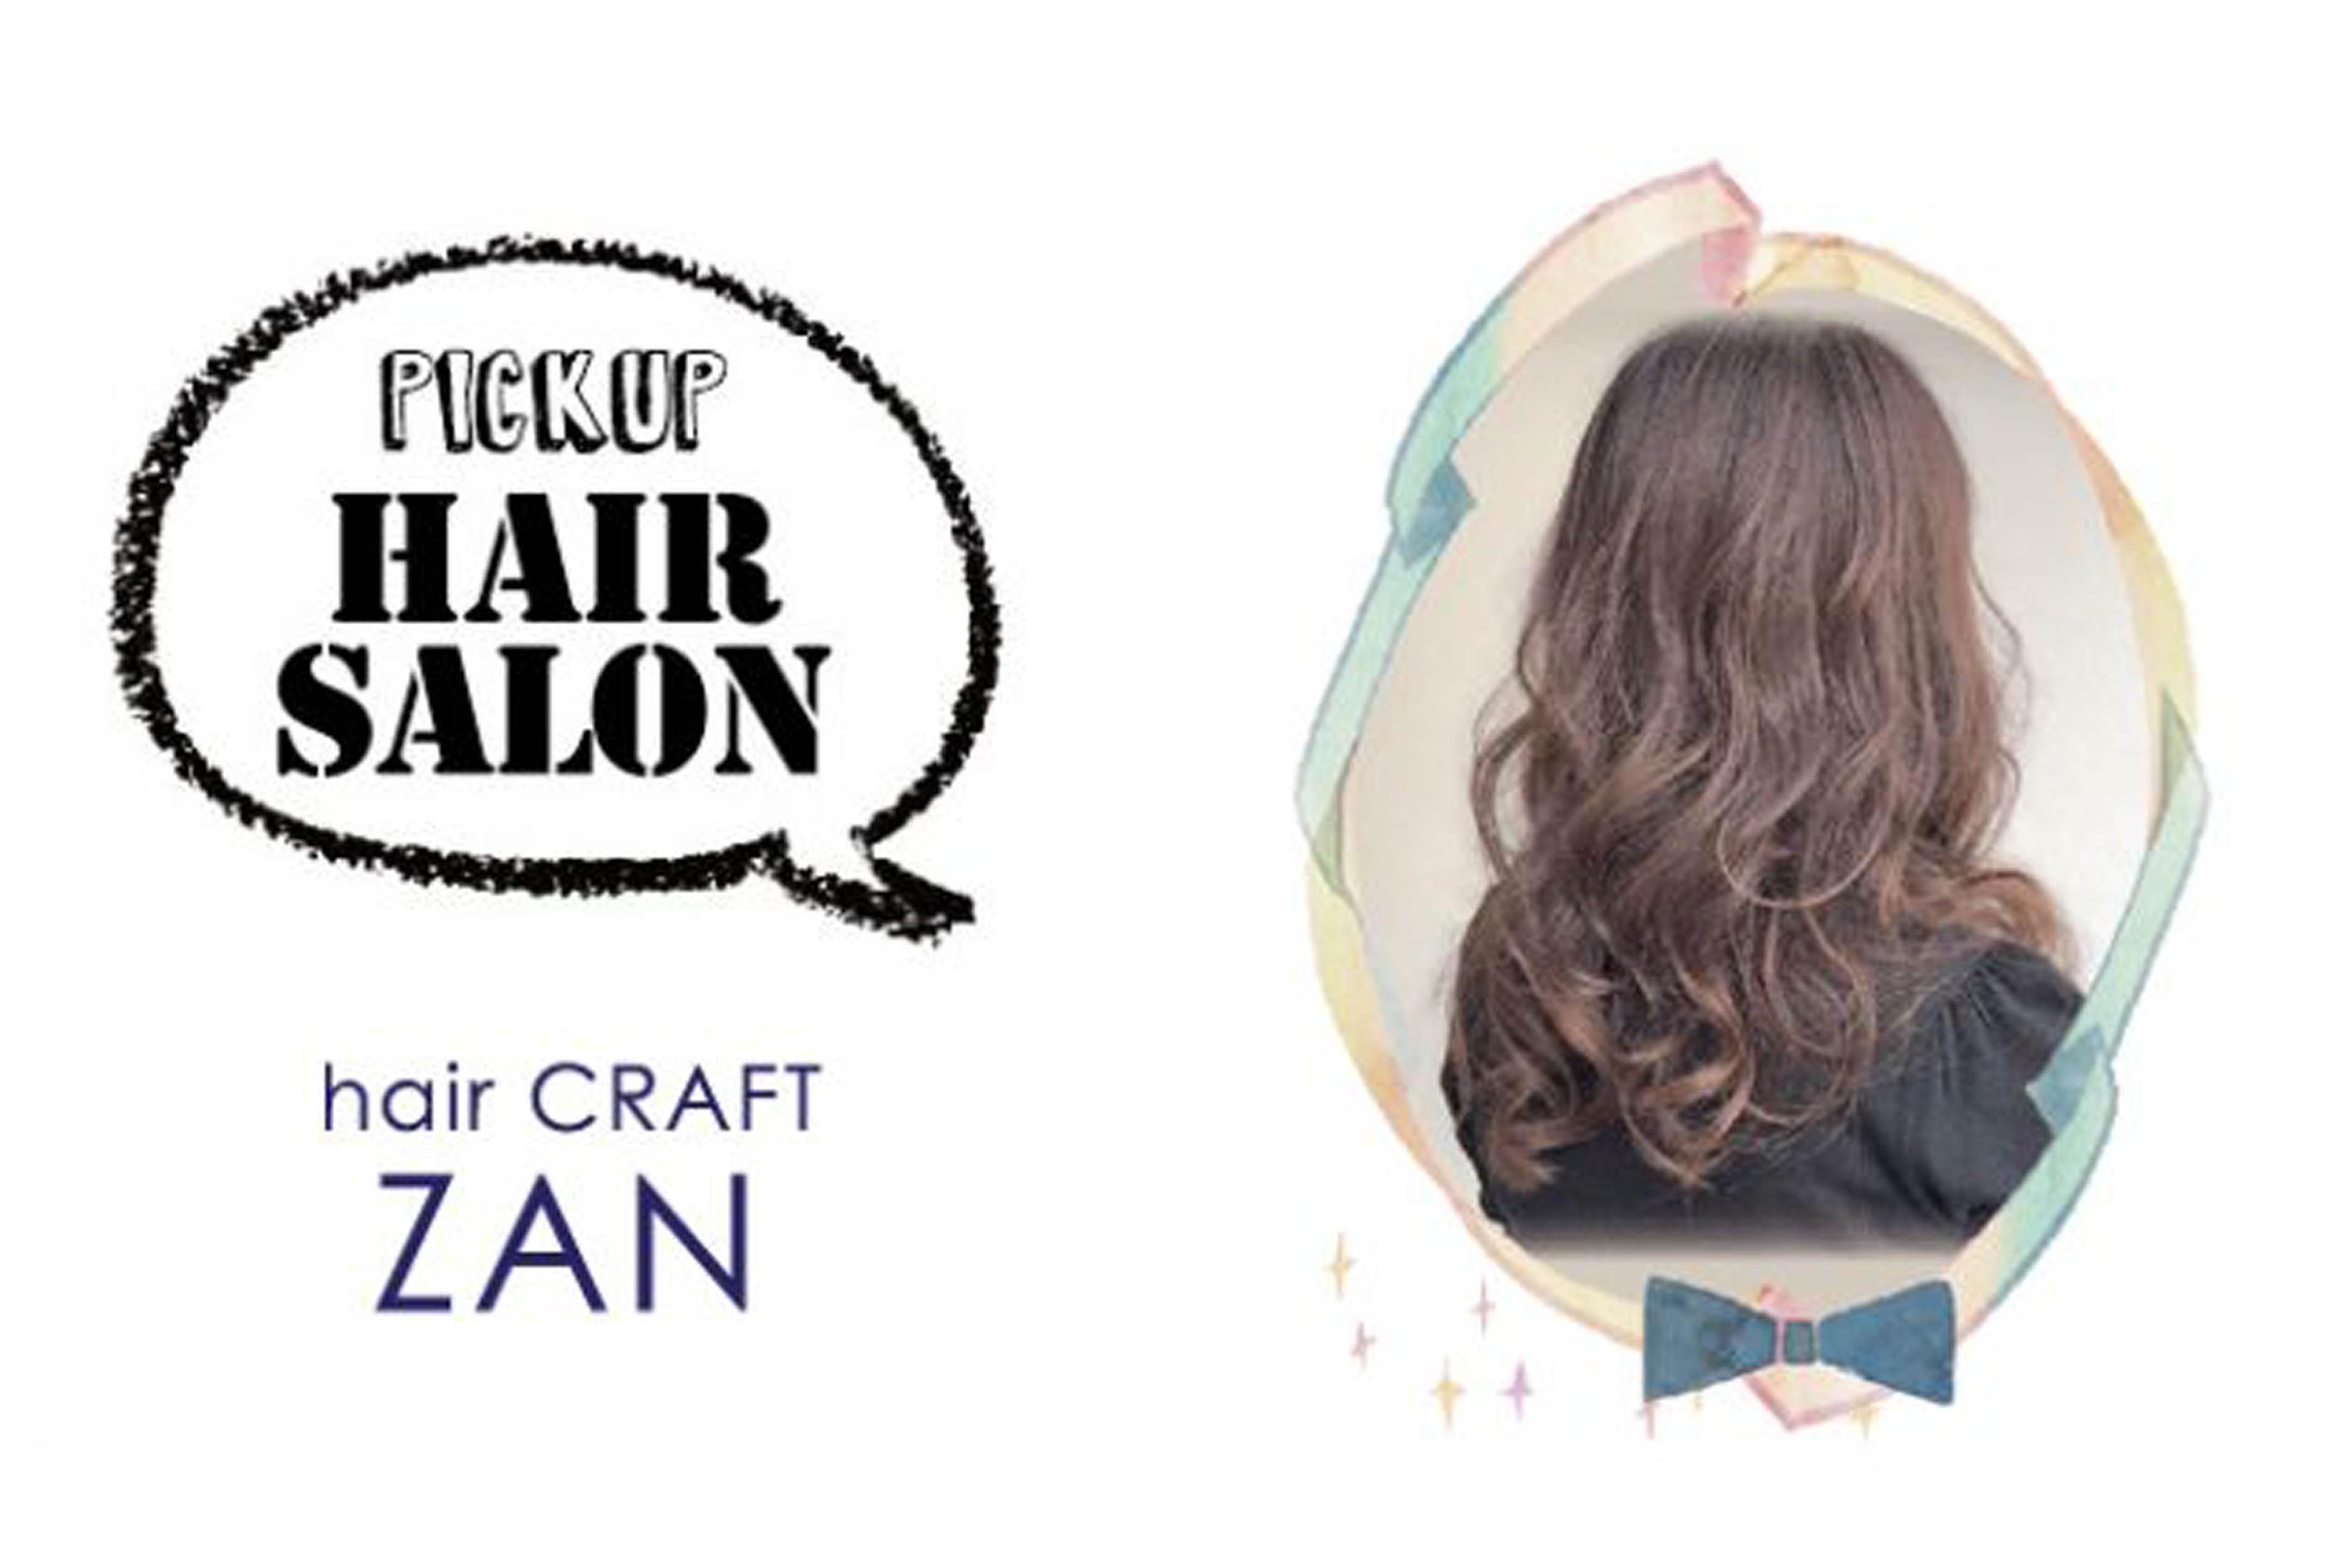 【PICK UP HAIR SALON】hair CRAFT ZAN - ワイズデジタル【タイで生活する人のための情報サイト】